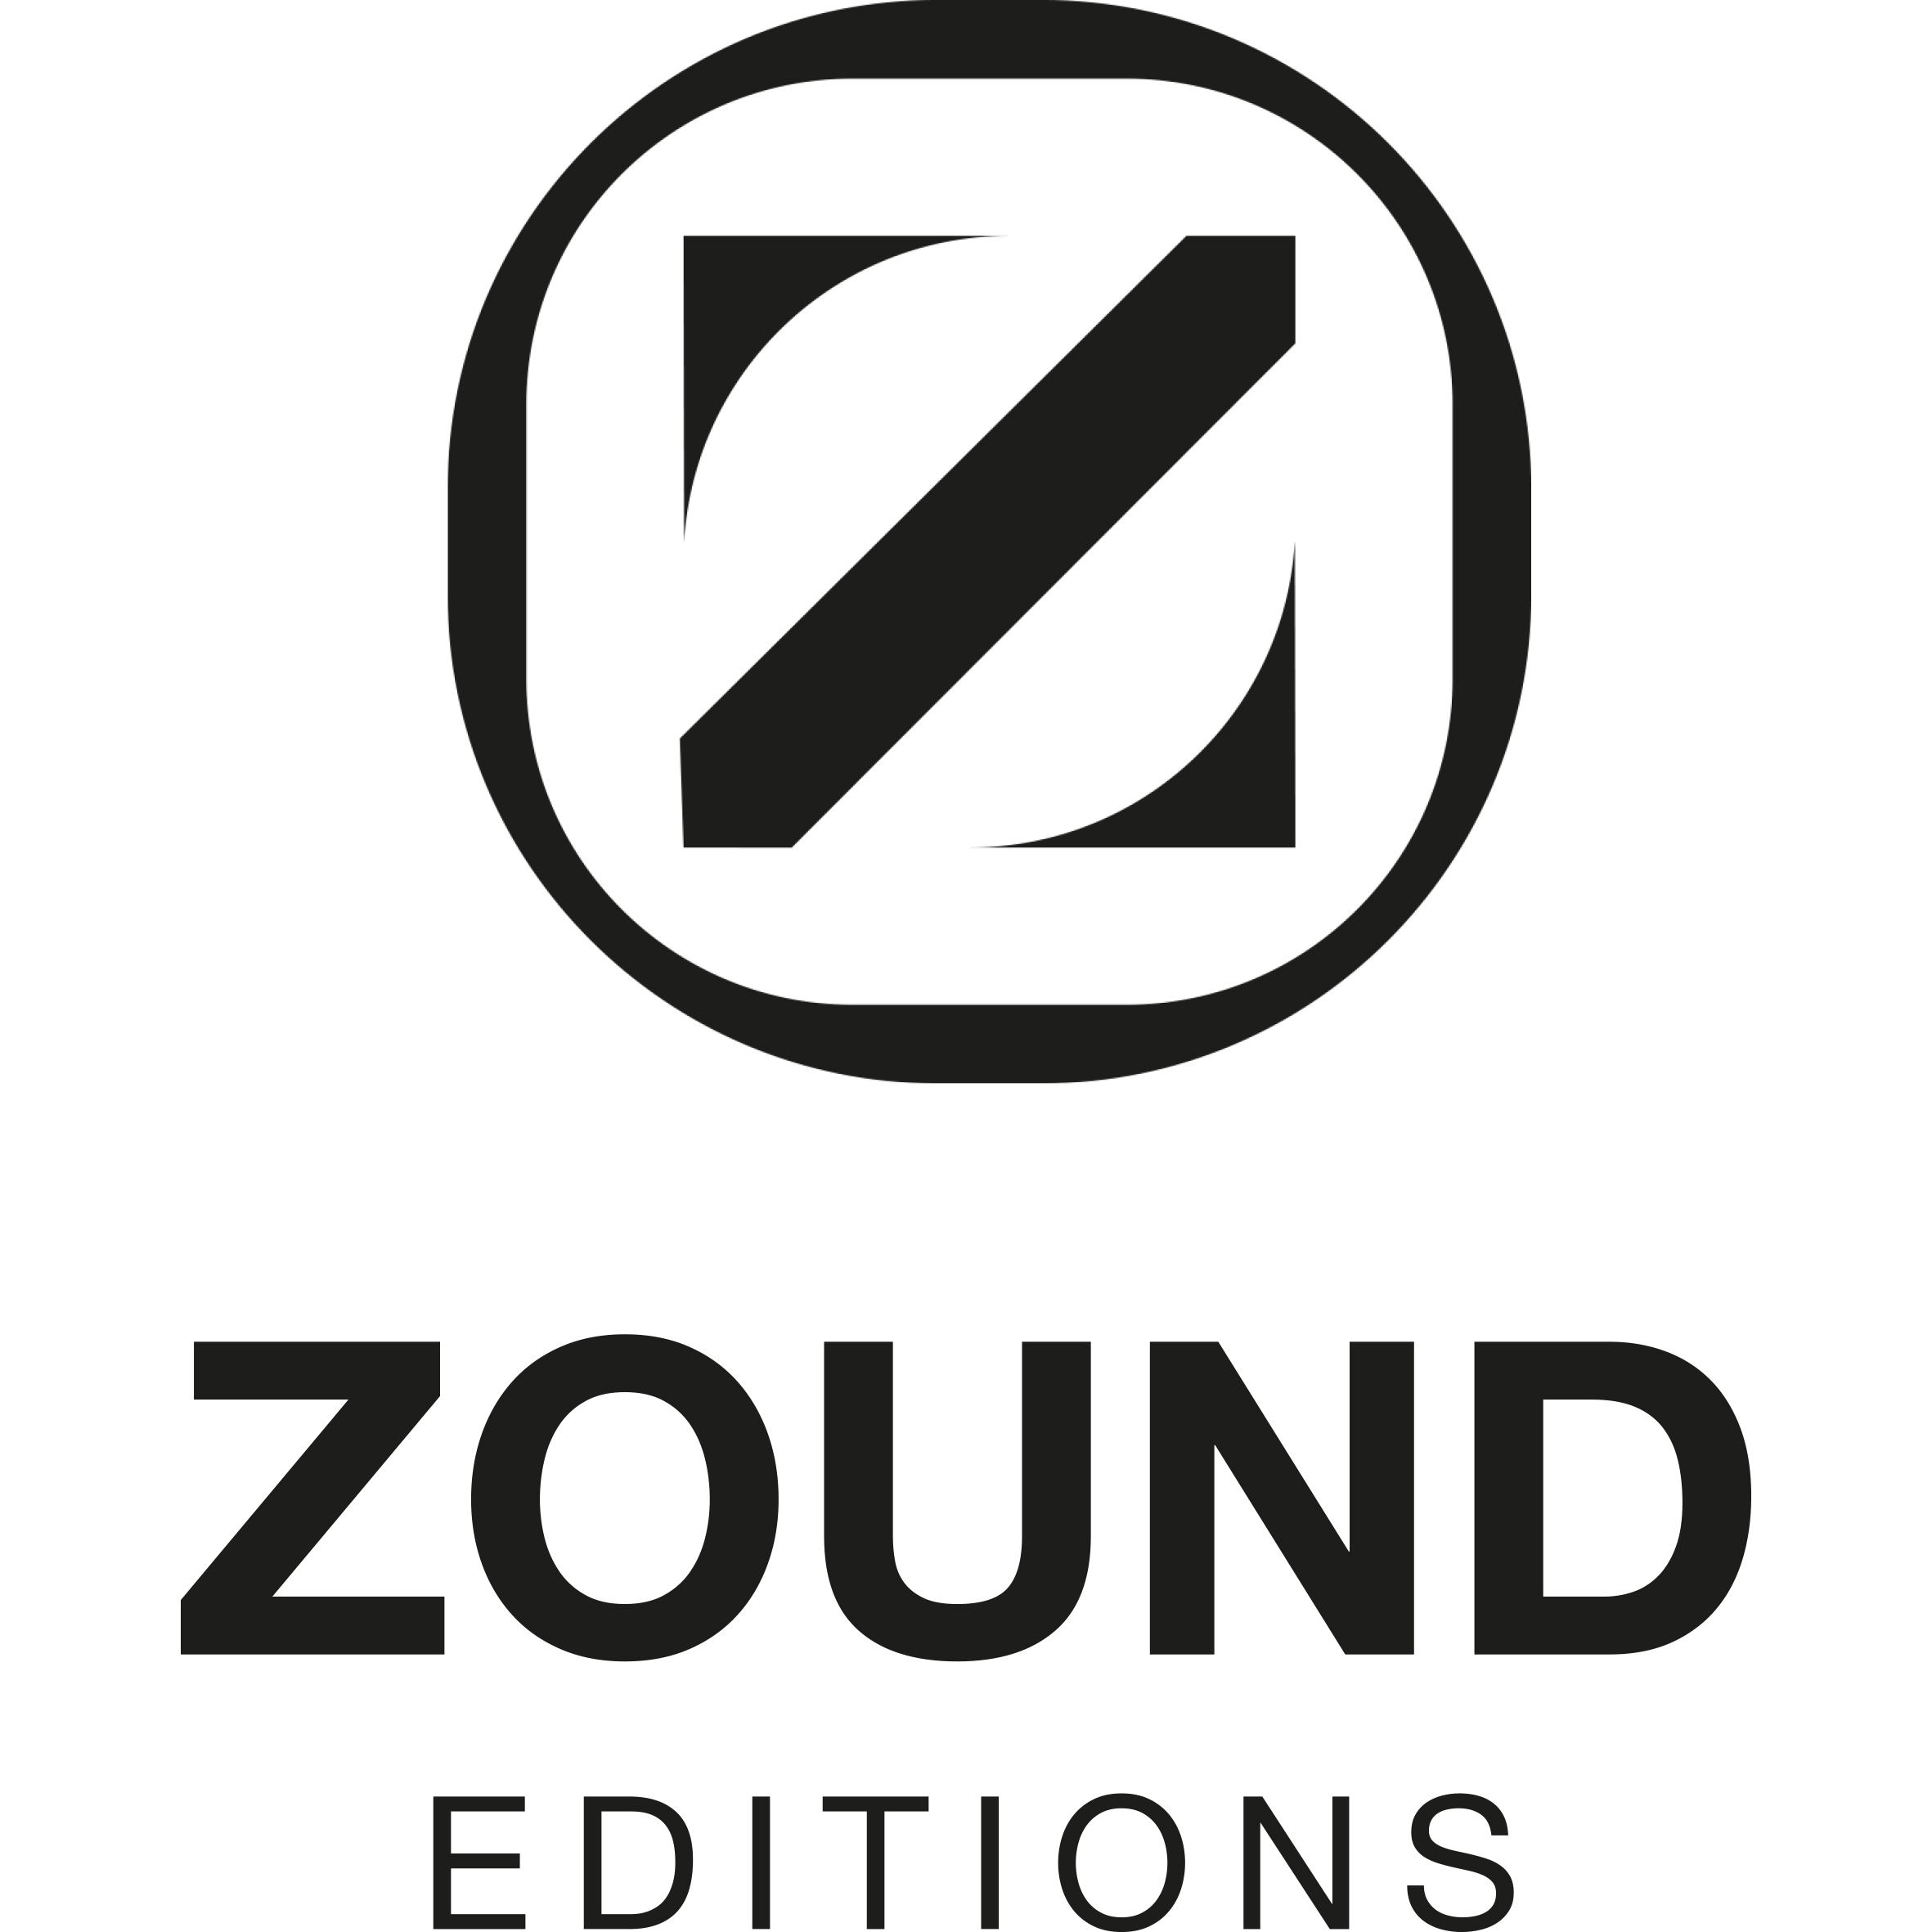 Zound Editions